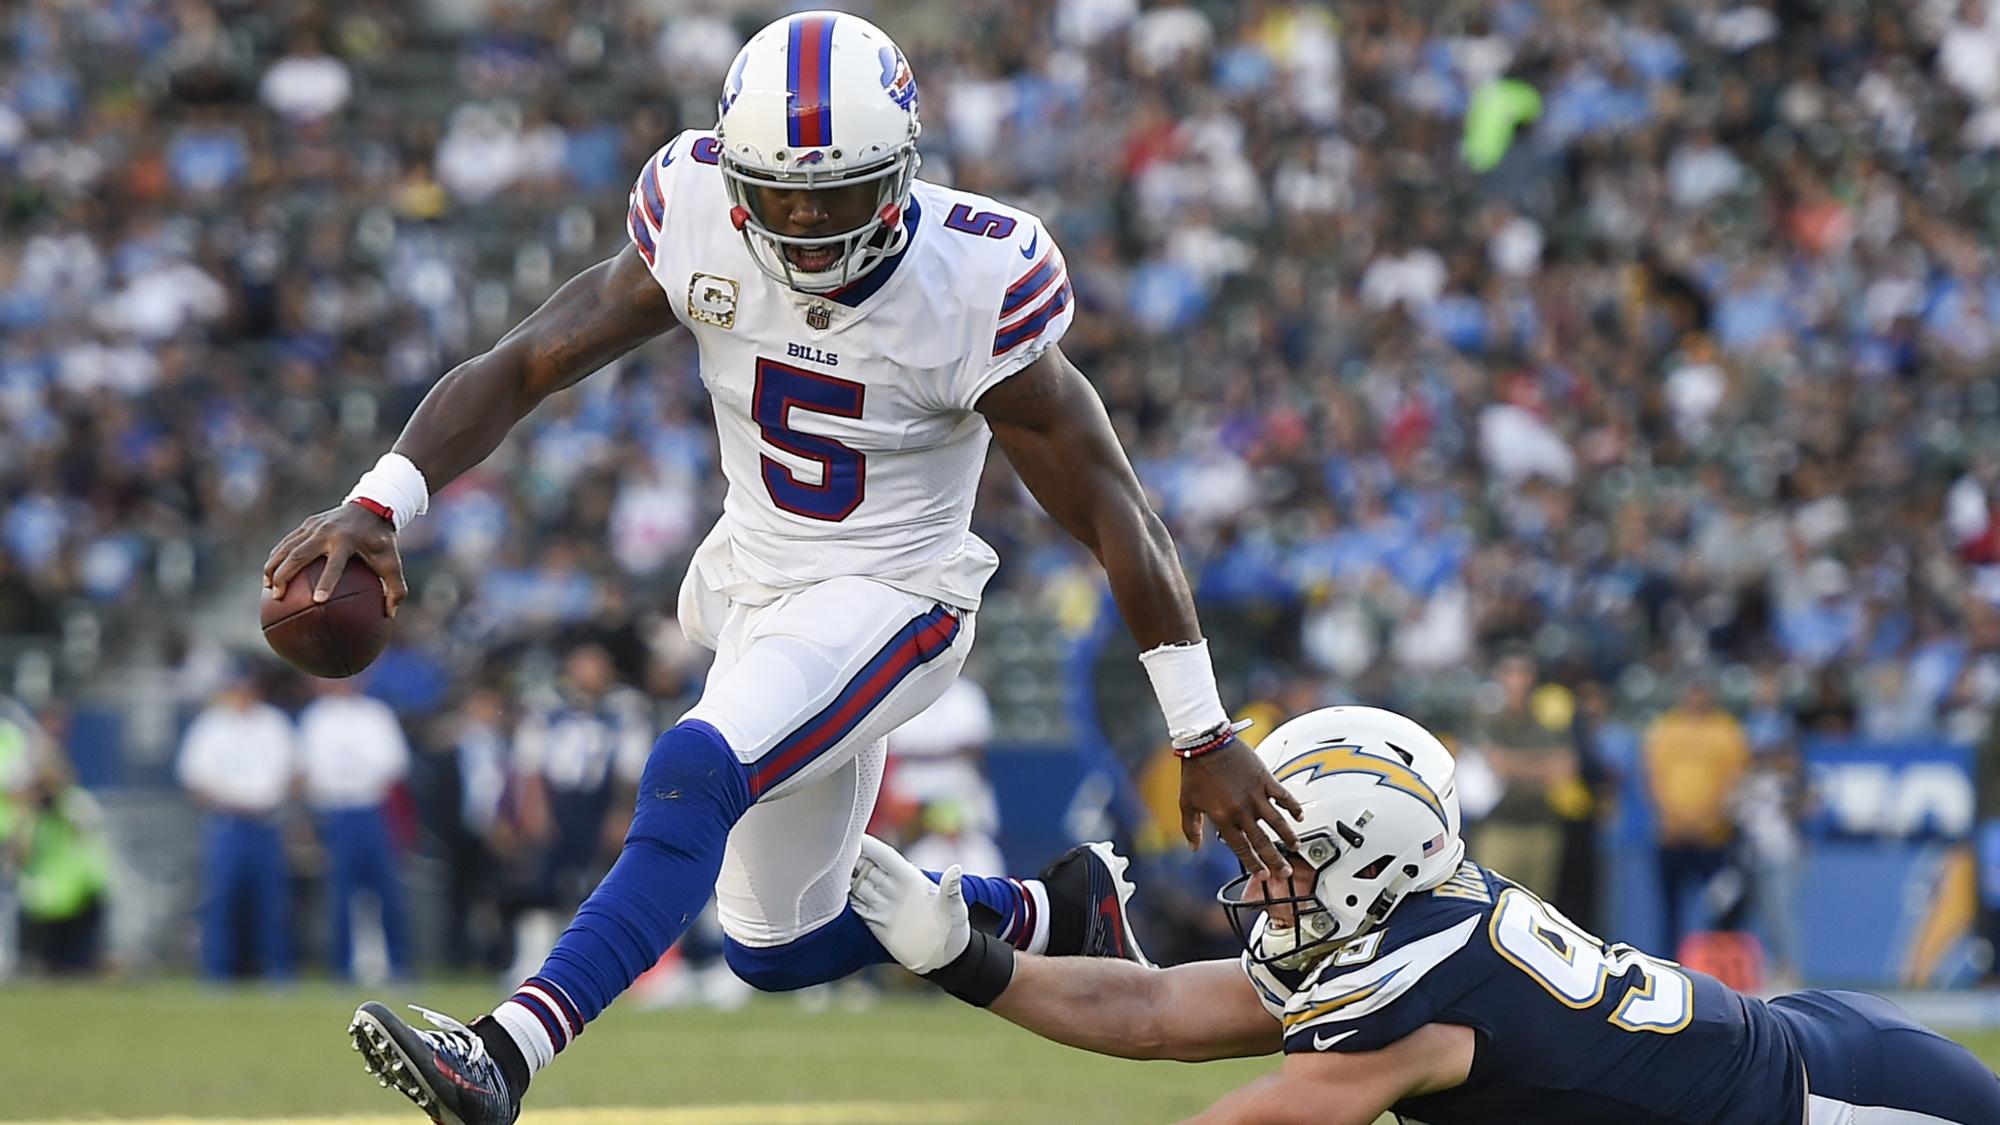 NFL: Buffalo Bills at Los Angeles Chargers